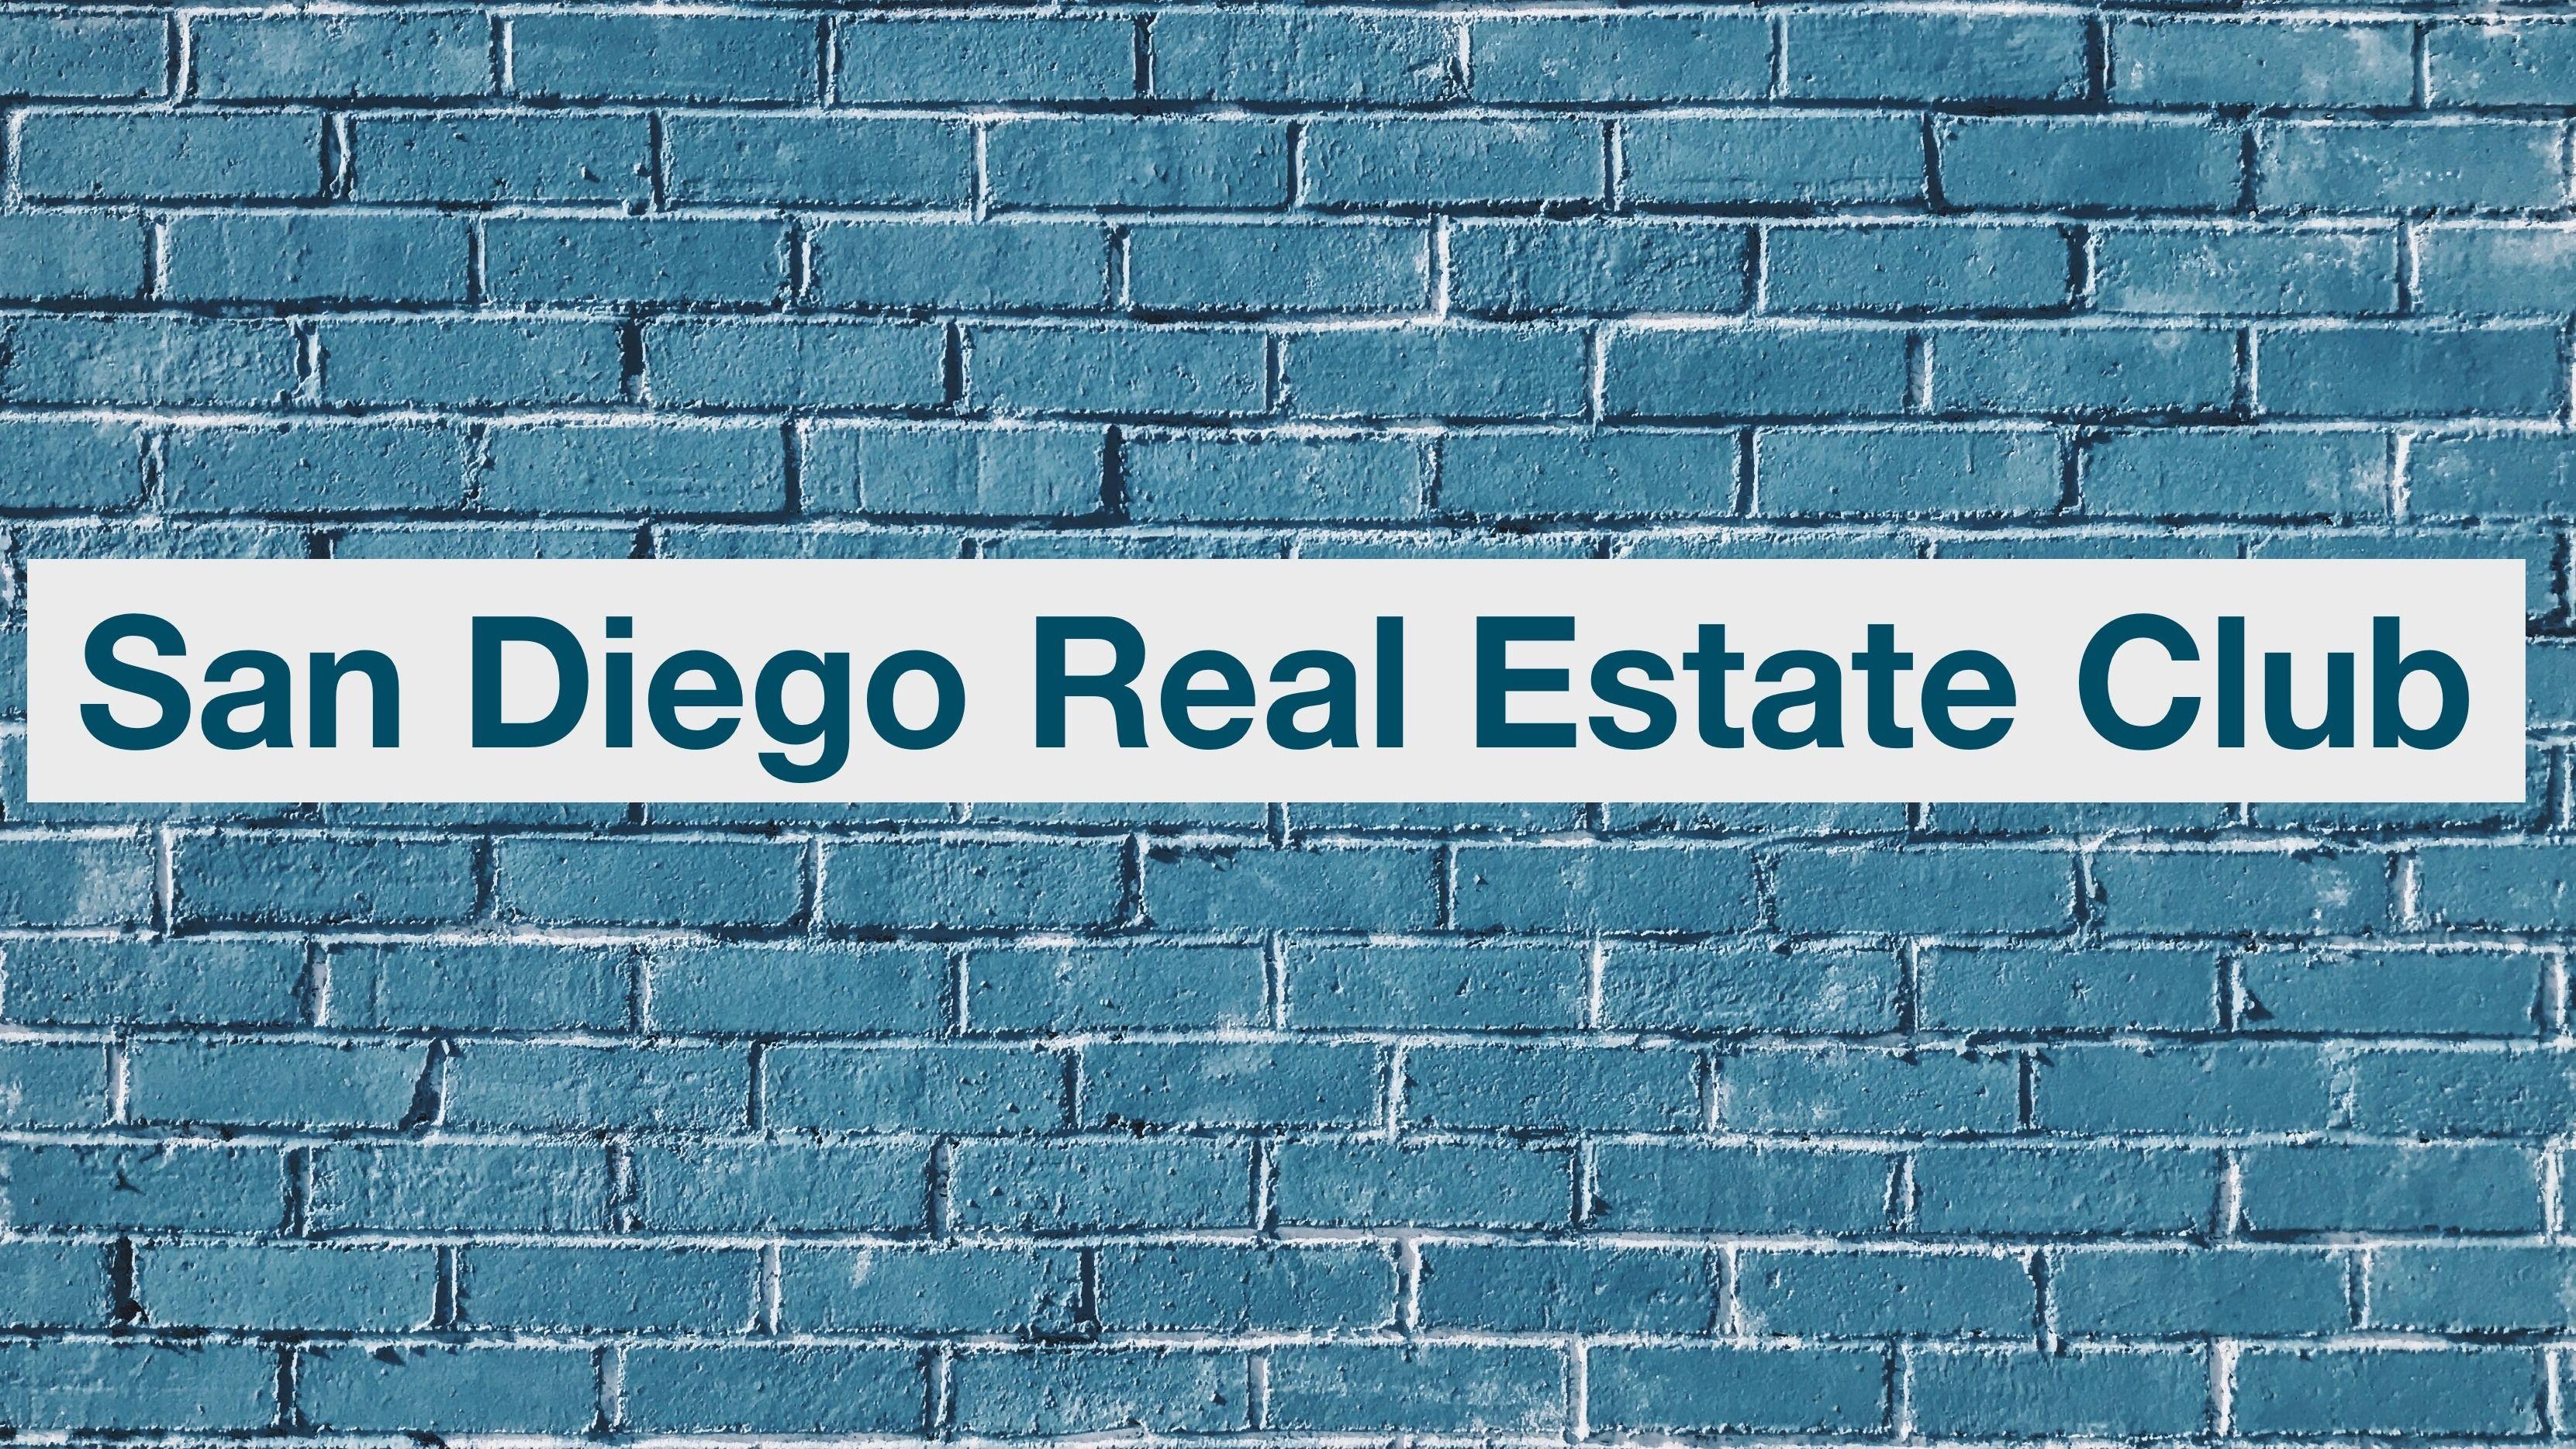 Real estate investment club san diego ca trade interceptor forex mobile gmma